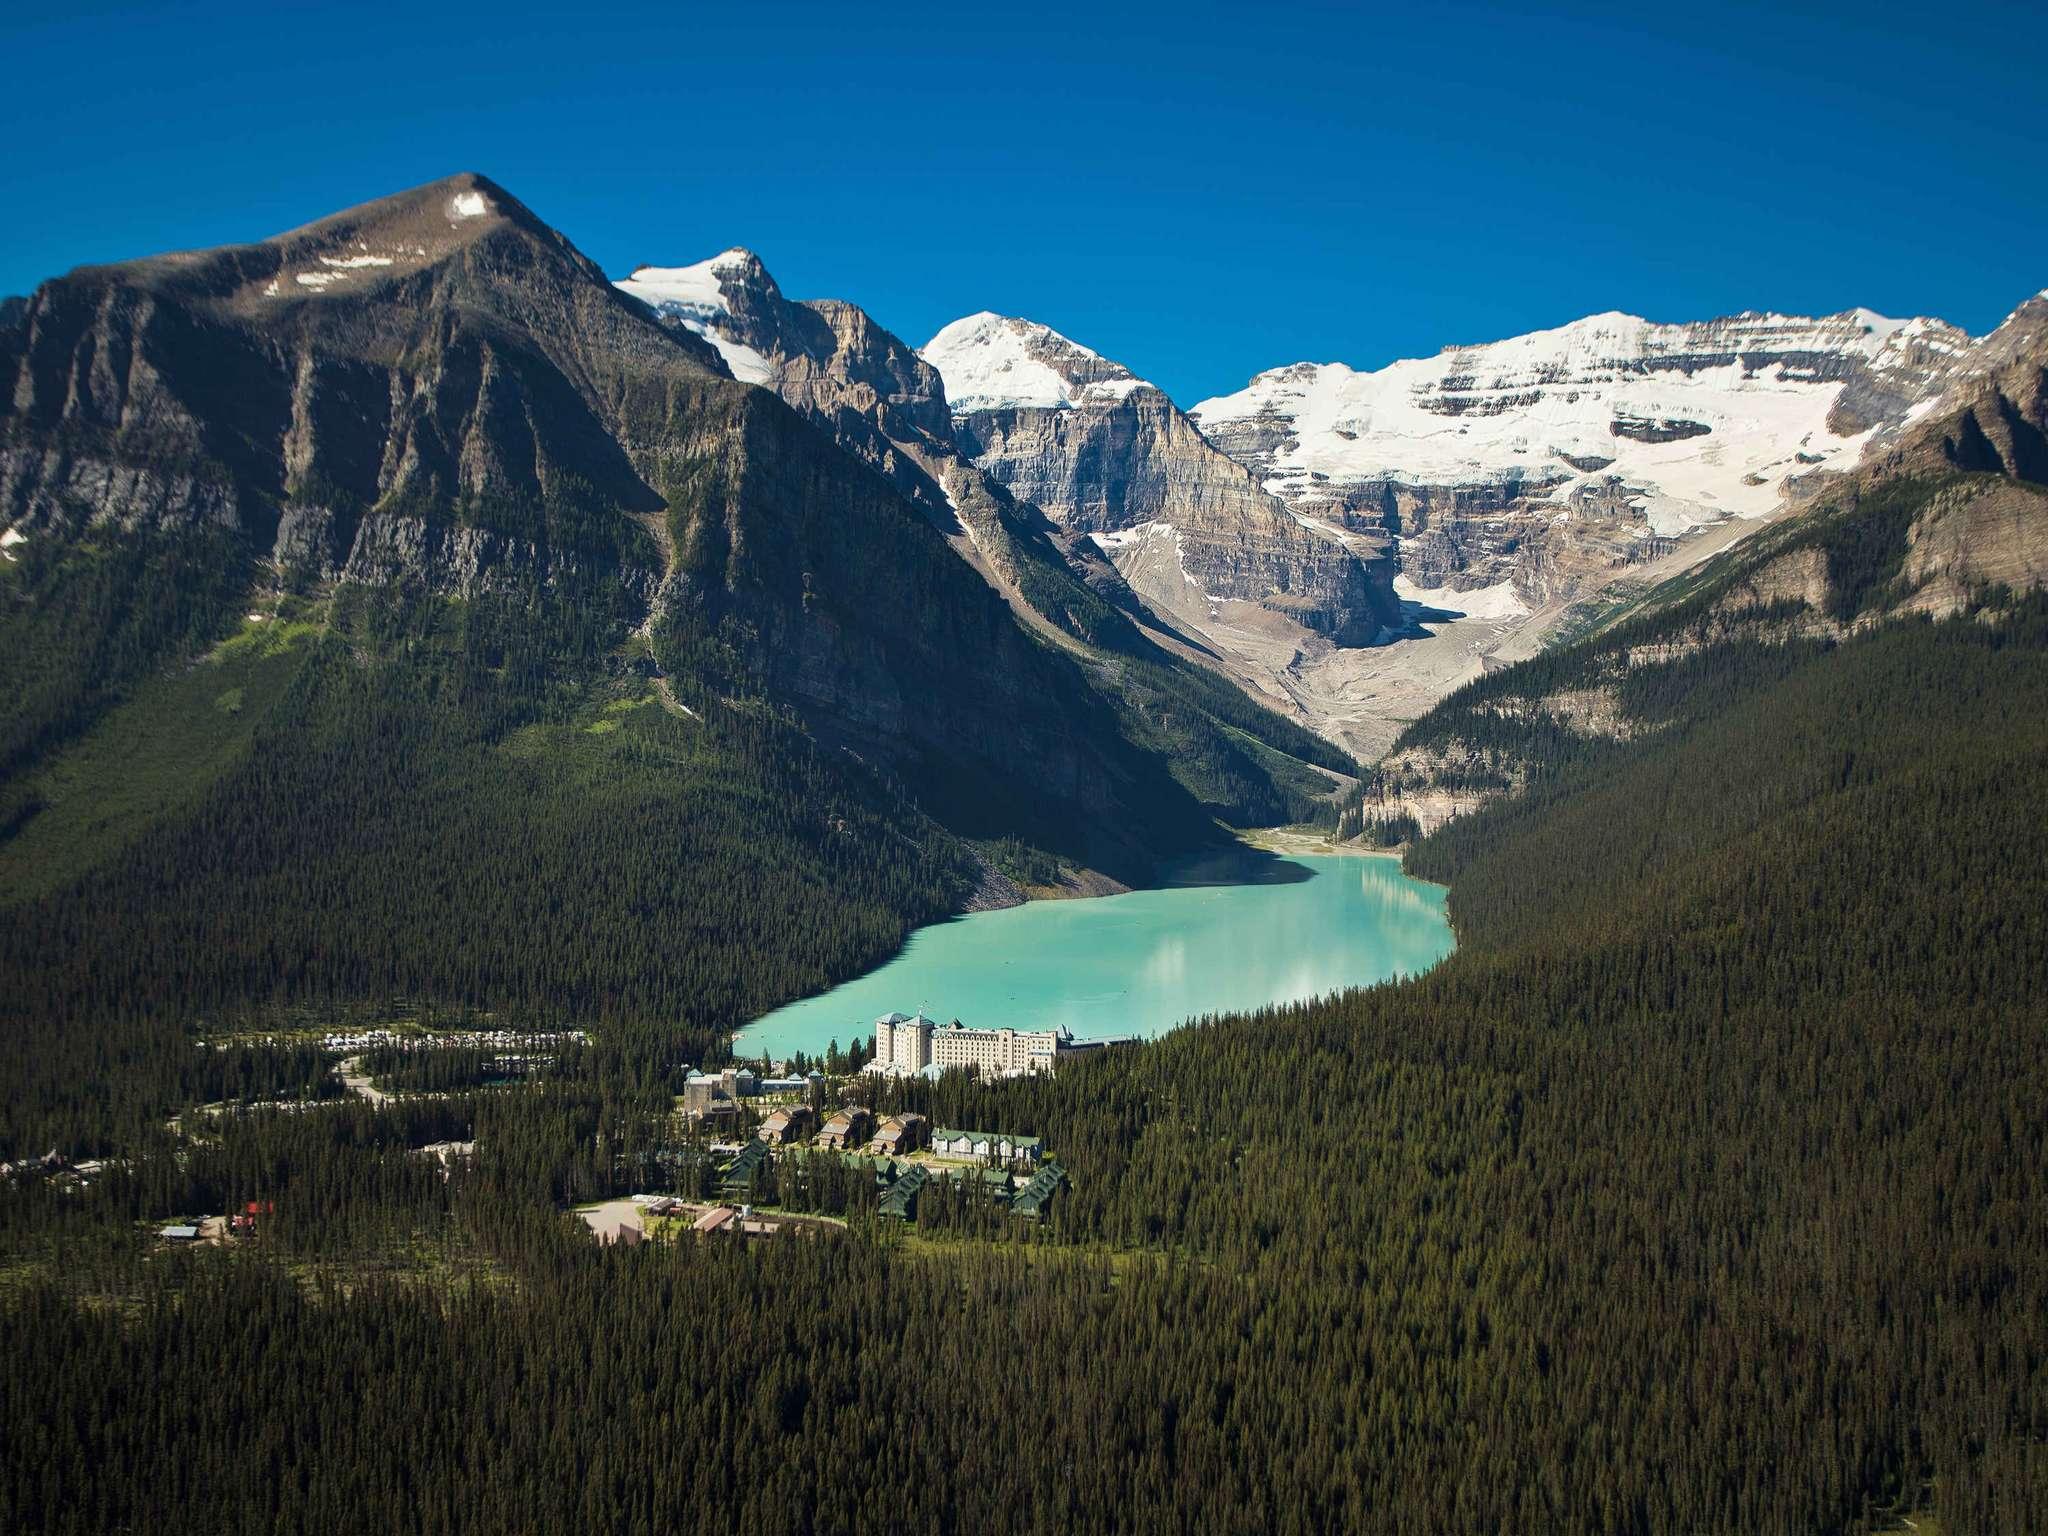 Hotel in lake louise - Fairmont Château Lake Louise